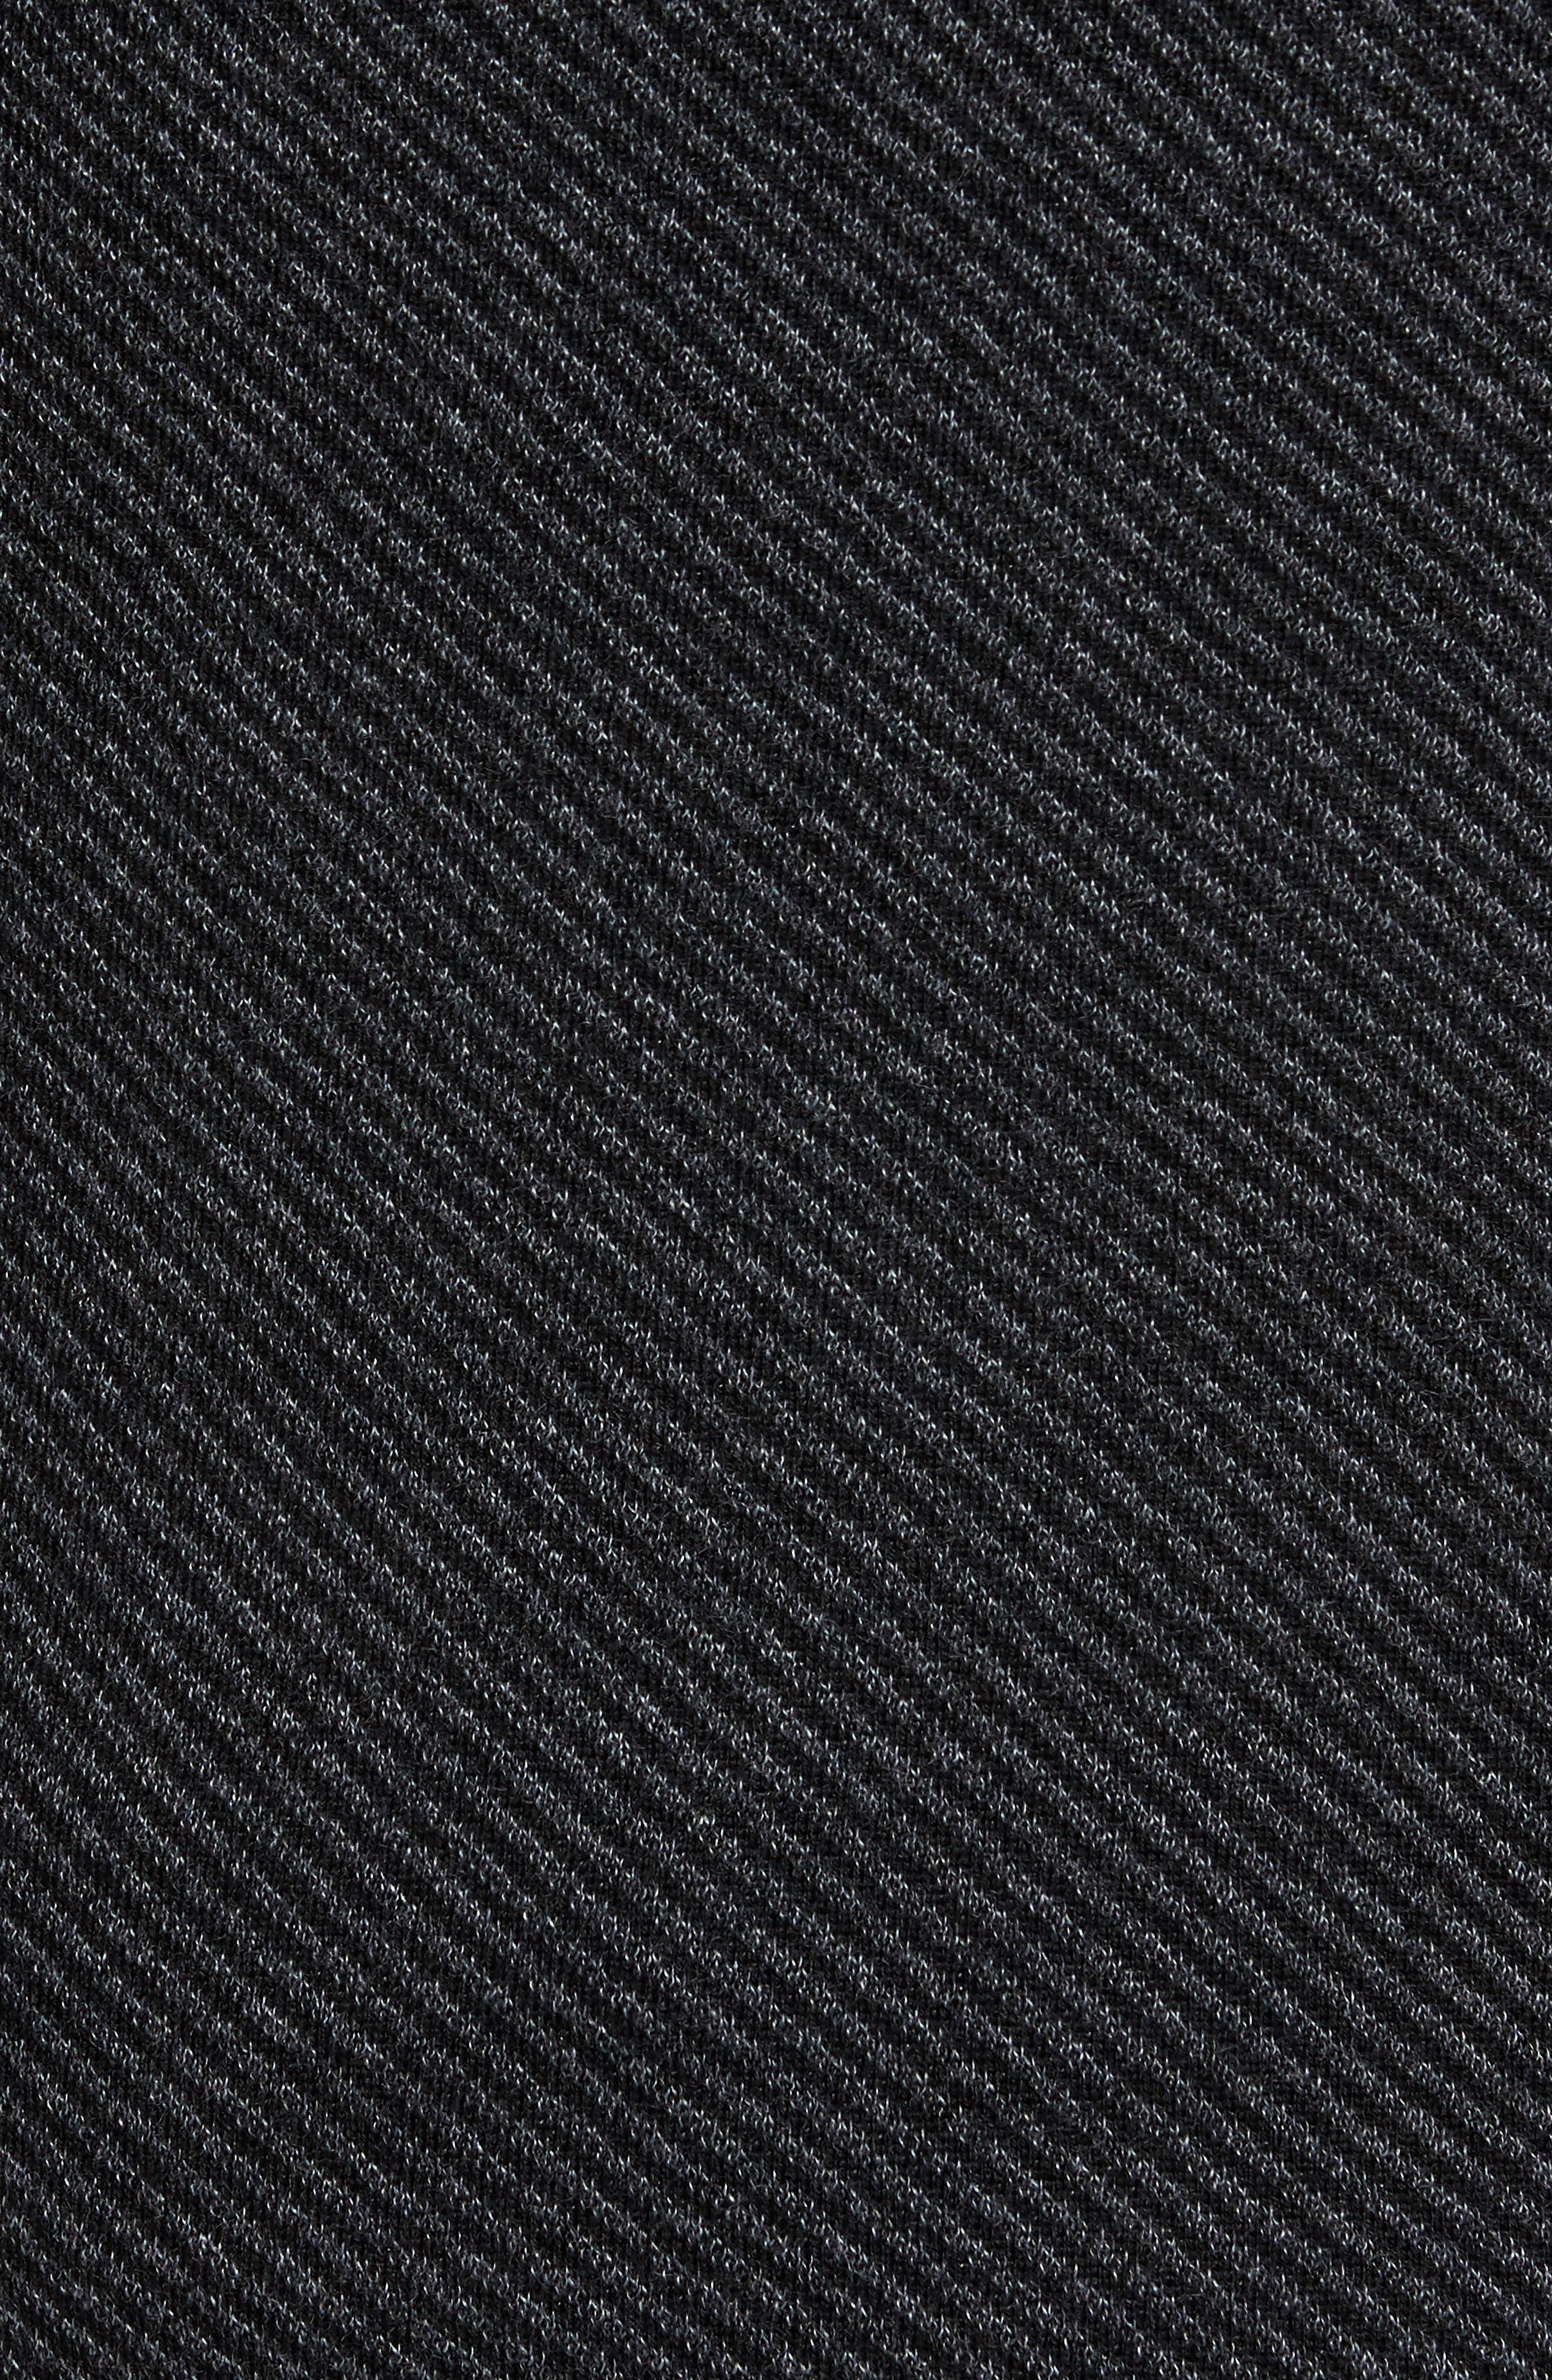 Cinamon Interest Stitch Crewneck Sweater,                             Alternate thumbnail 5, color,                             001